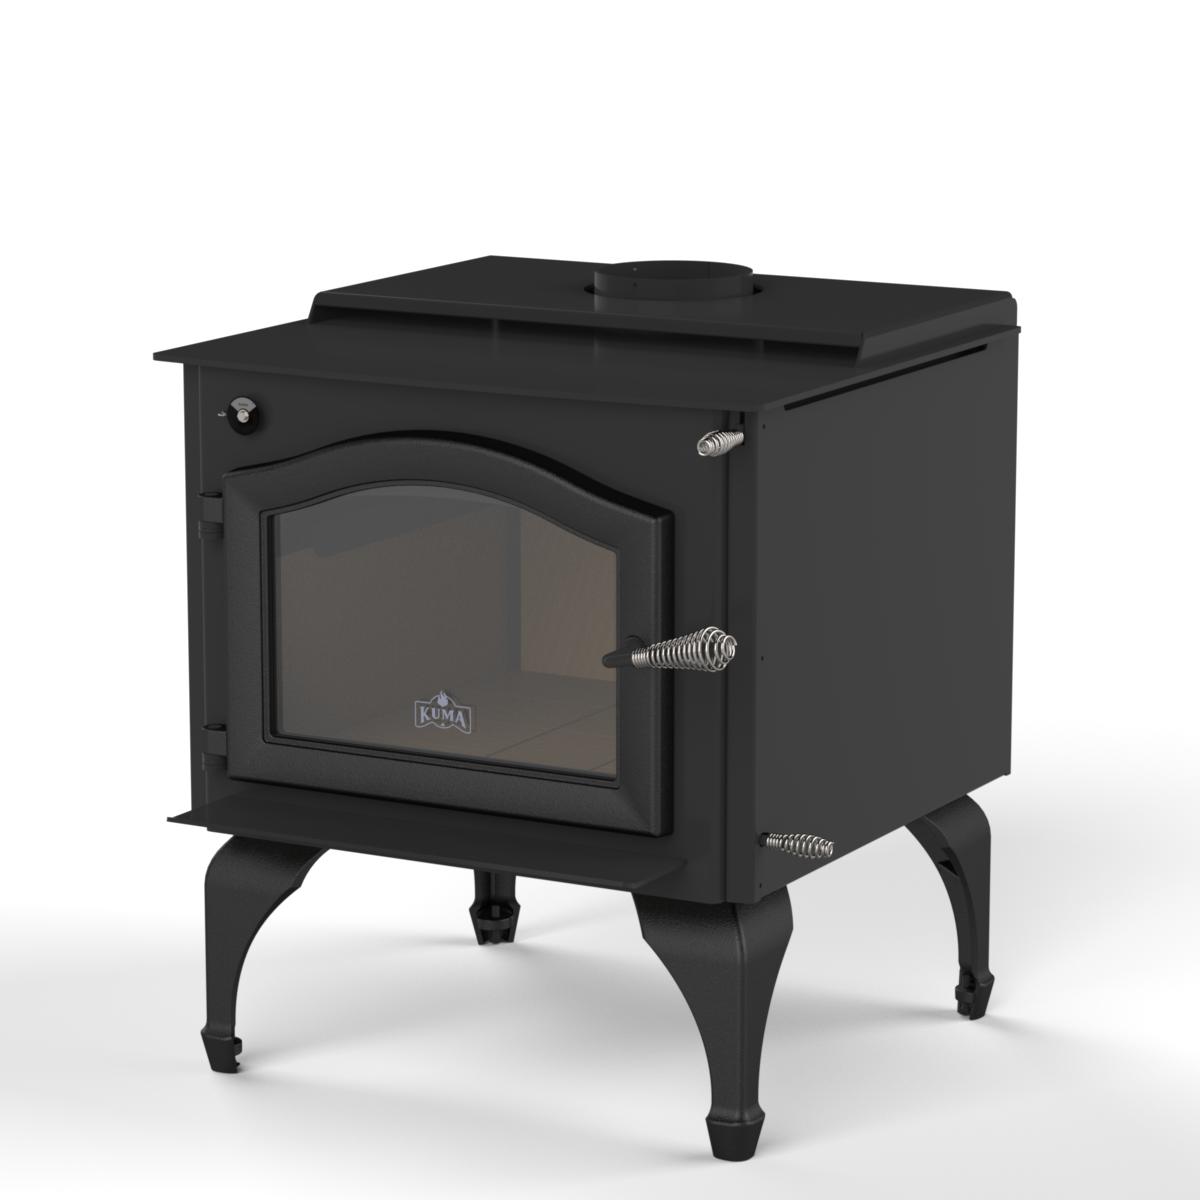 Ashwood Le Wood Stove And Fireplace From Kuma Stoves